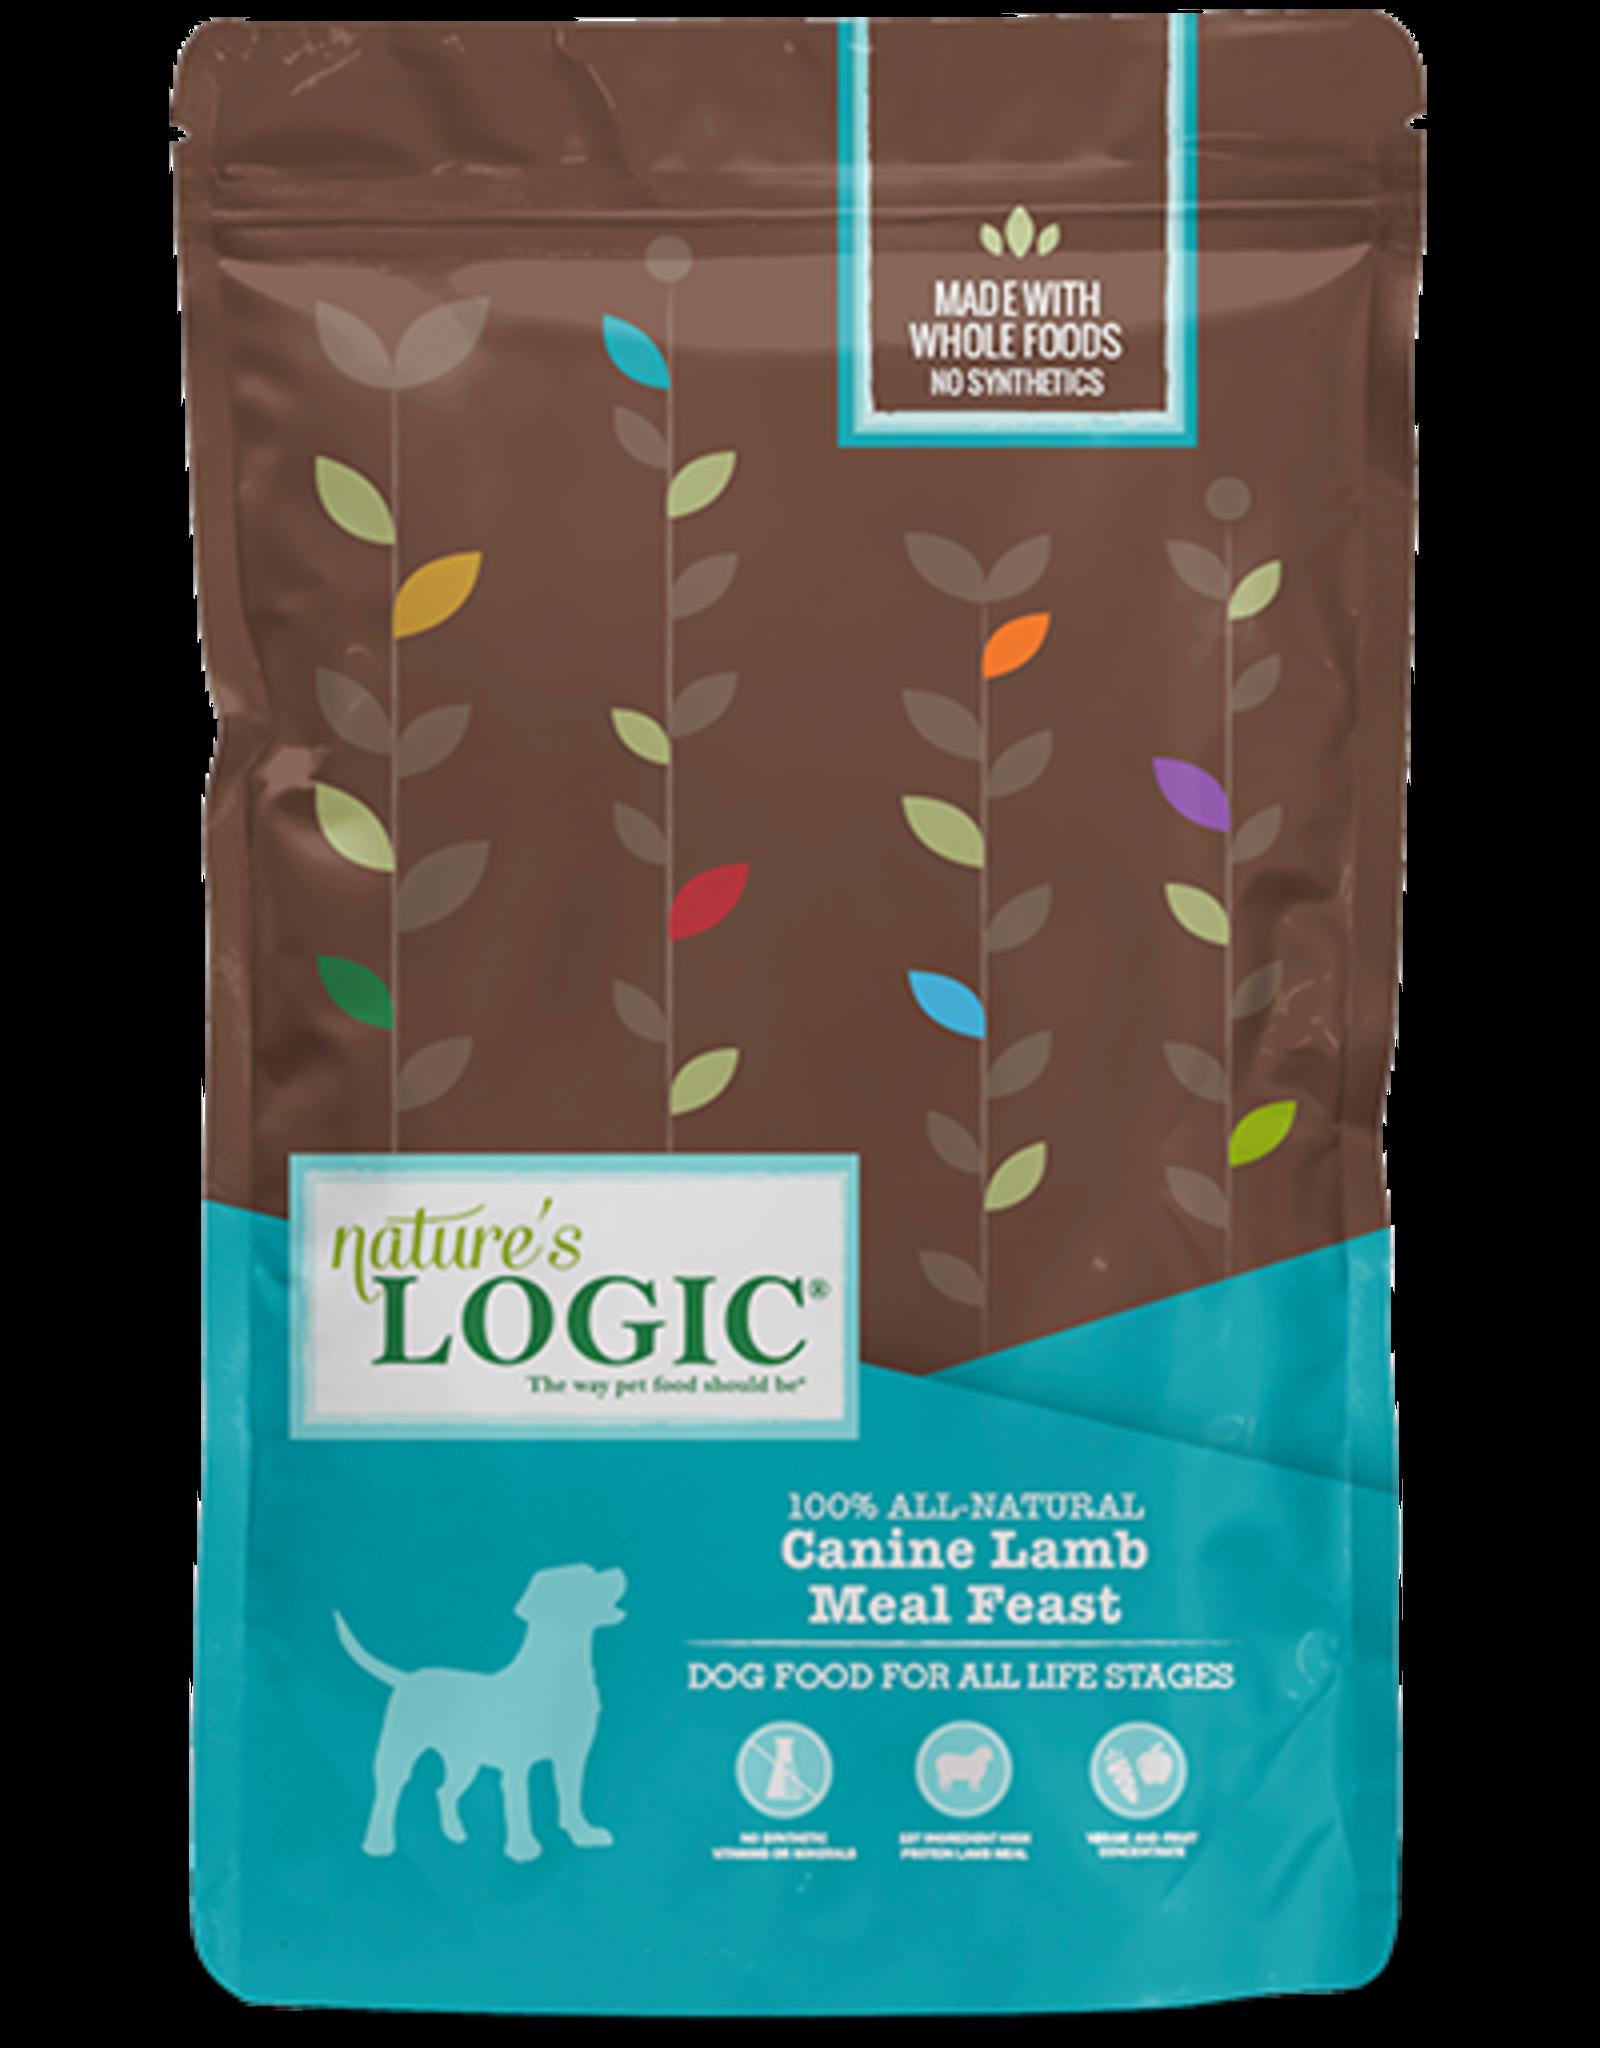 Natures Logic Canine Lamb Feast - Whole Grain 4.4lb